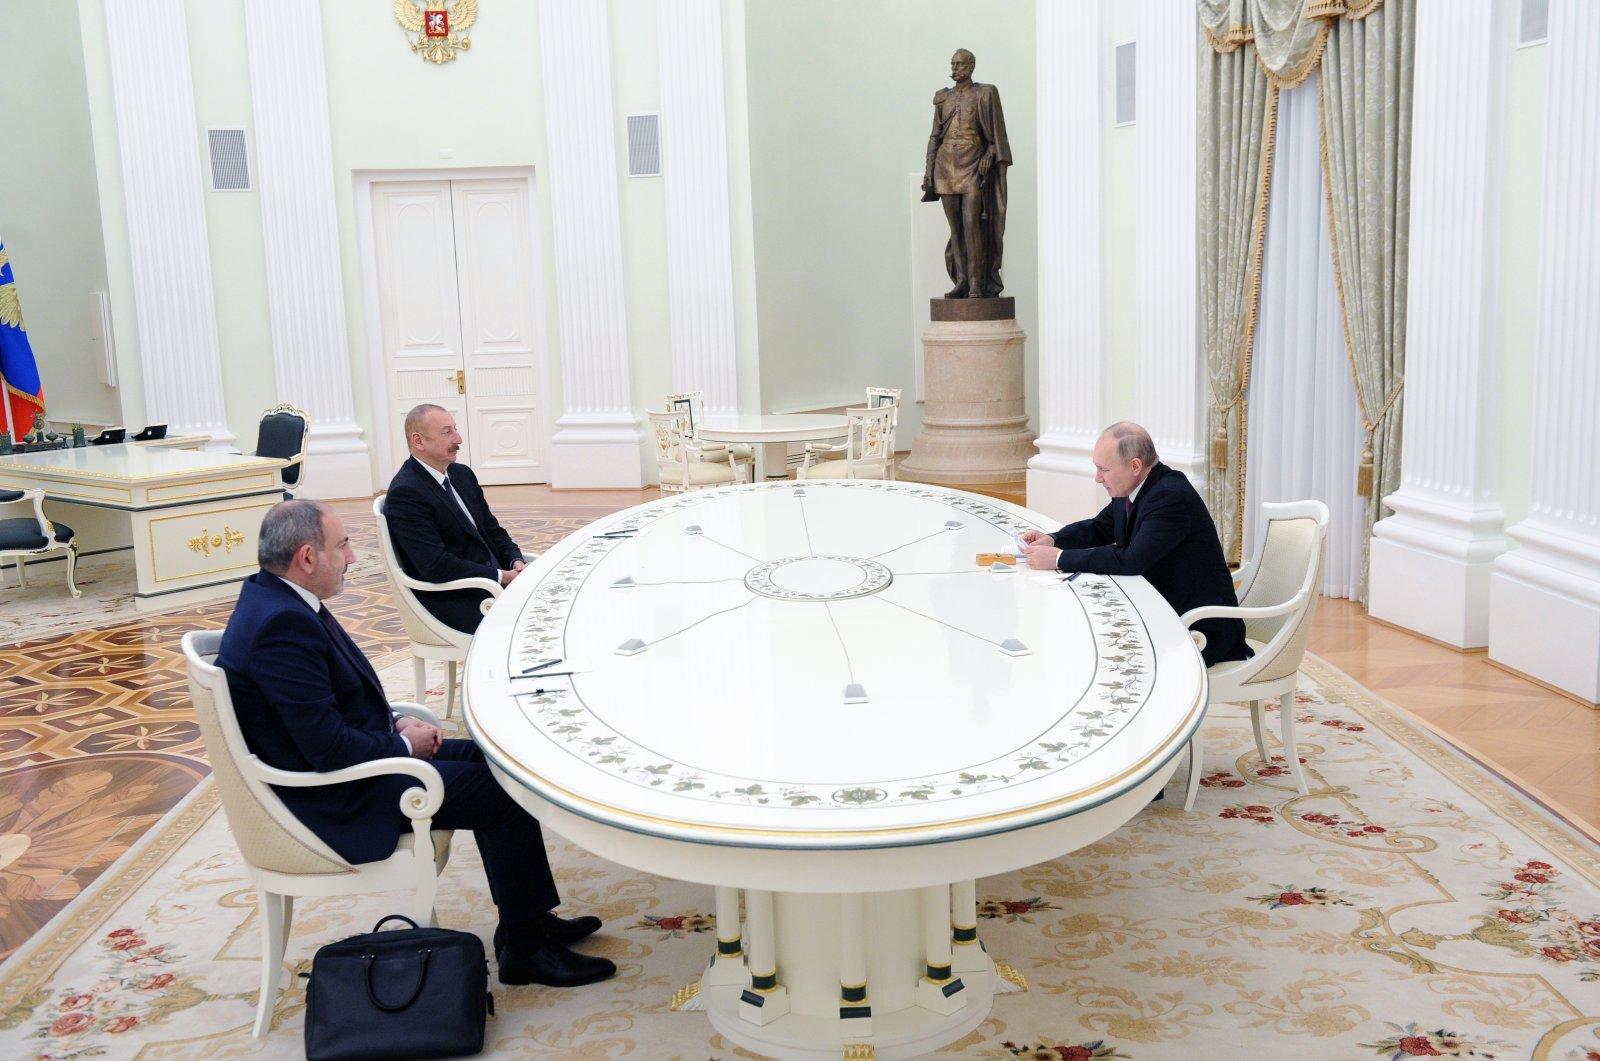 Armenian Prime Minister Nikol Pashinyan (L), Azerbaijan's President Ilham Aliyev (C) and Russian President Vladimir Putin attend a meeting in Moscow, Russia, Jan. 11, 2021. (AP Photo)